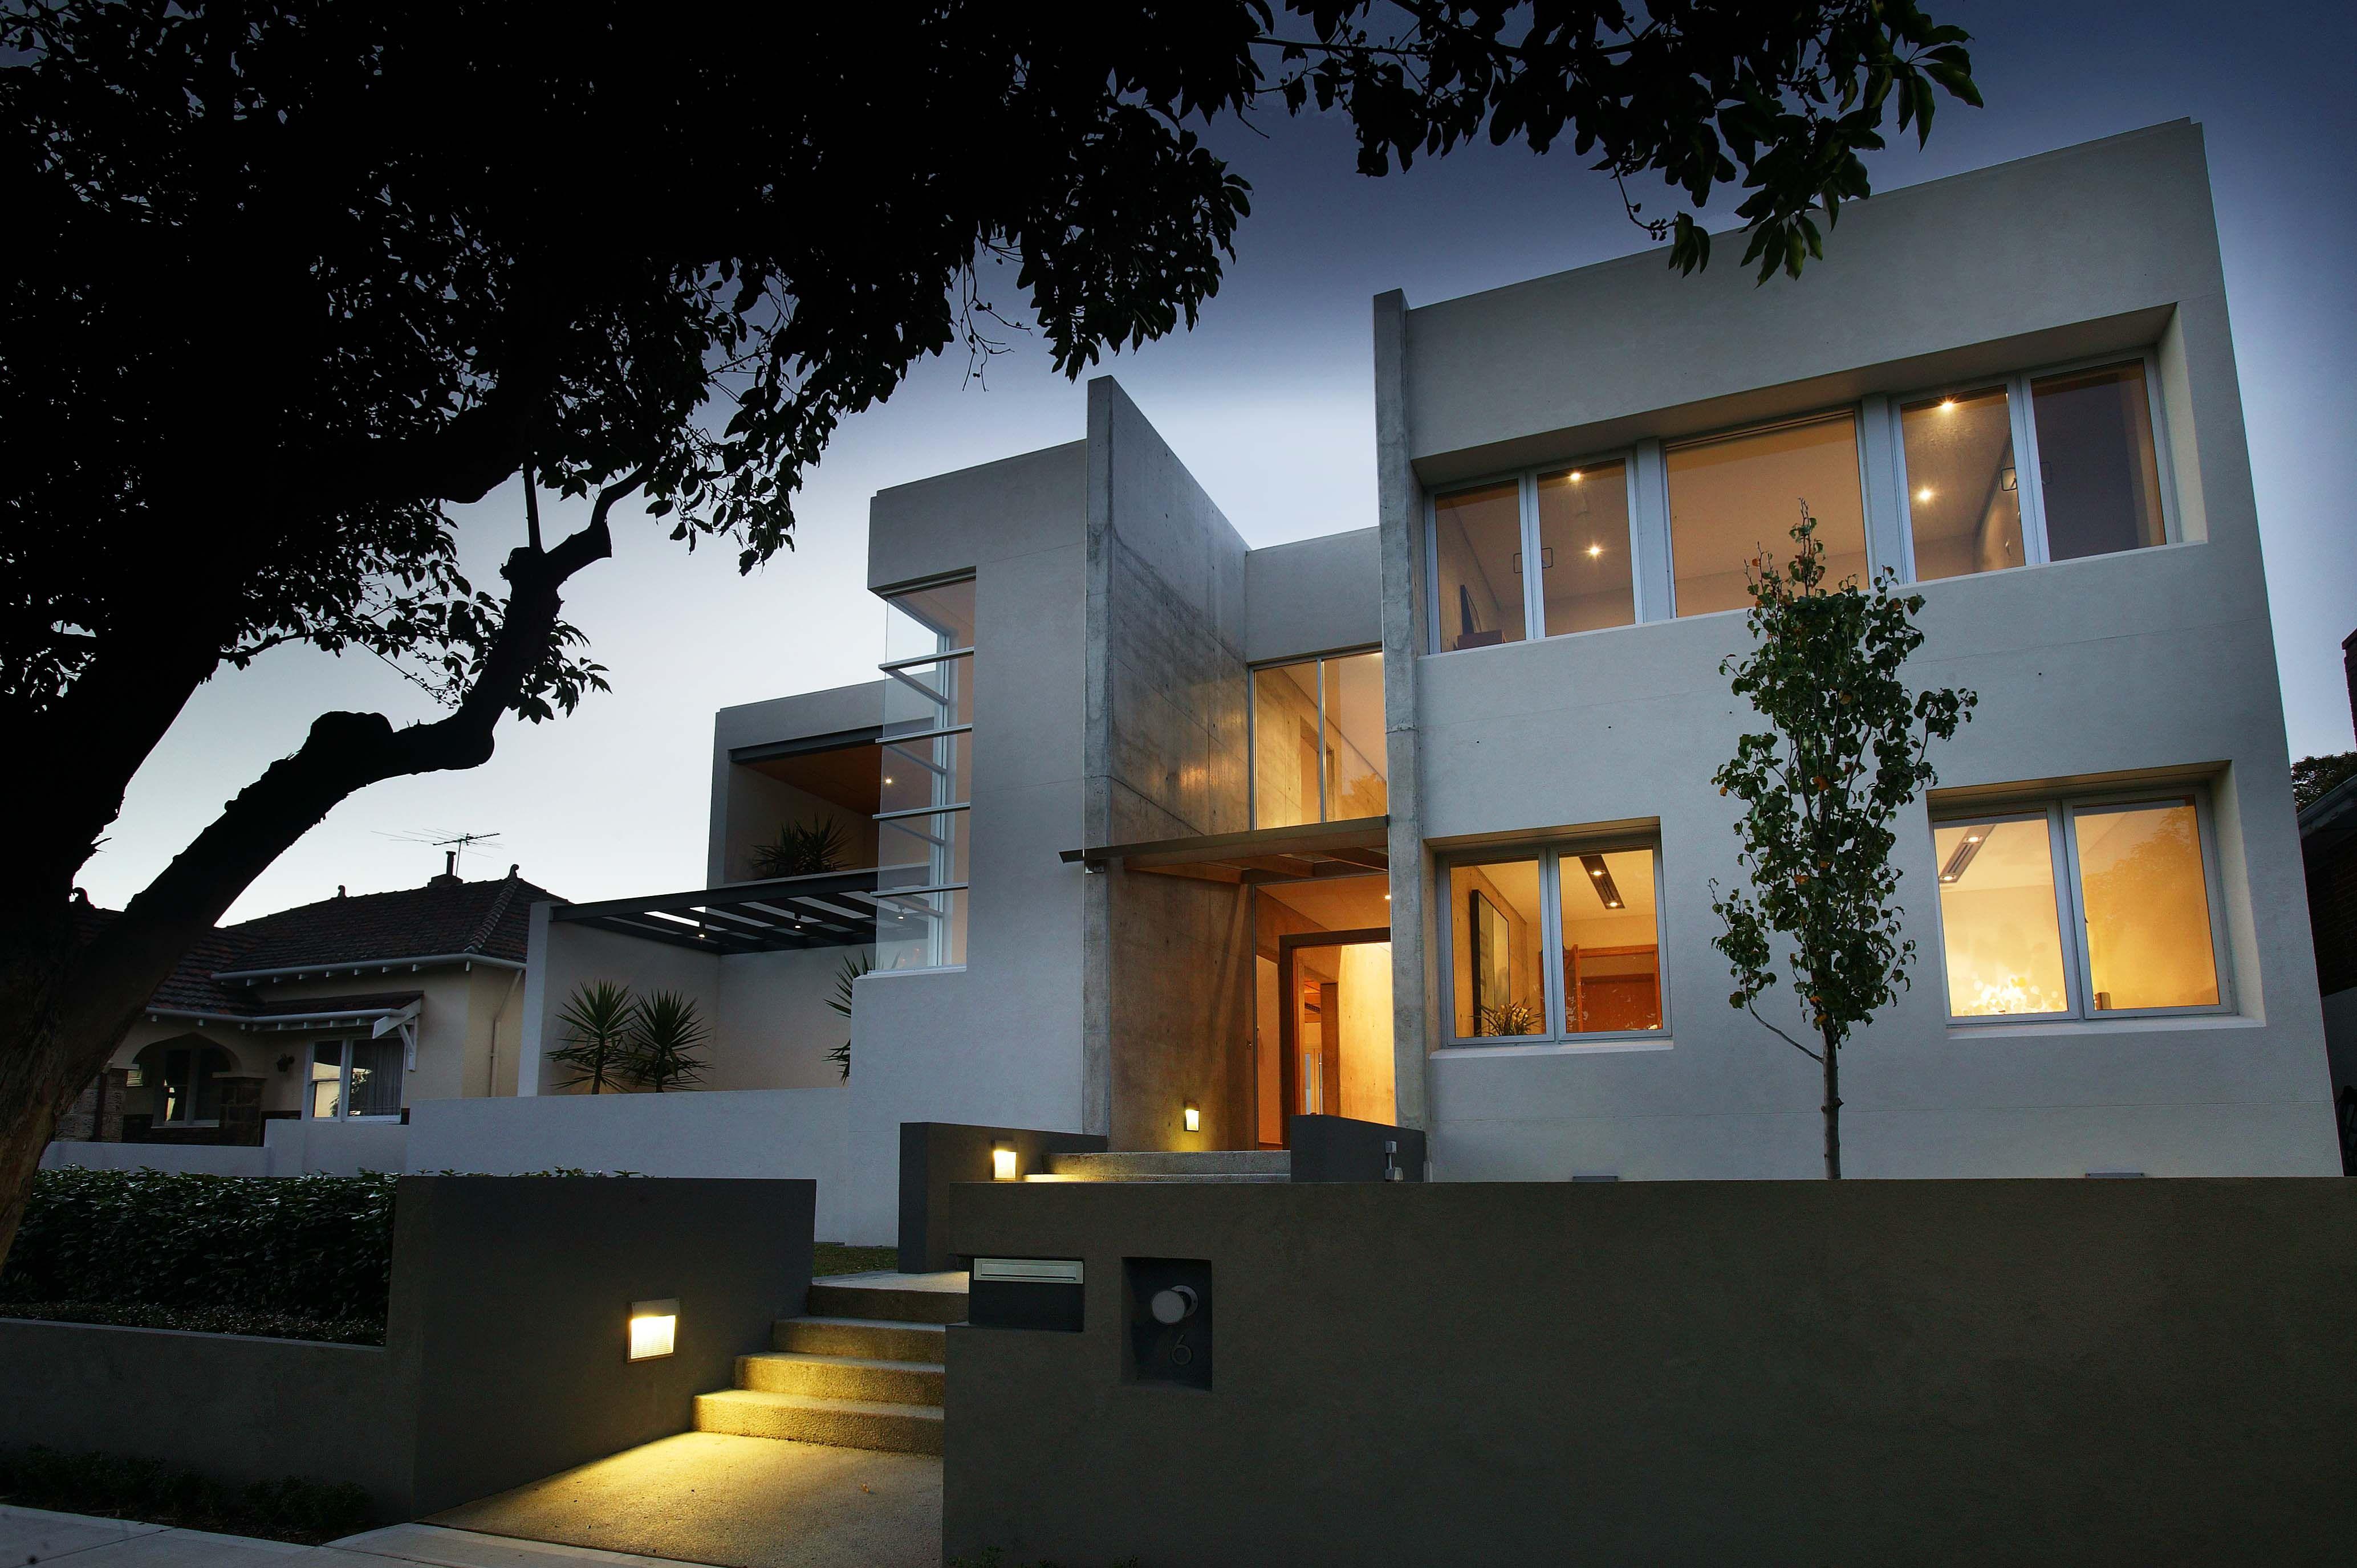 Explore Concrete Floors, Ground Floor And More!